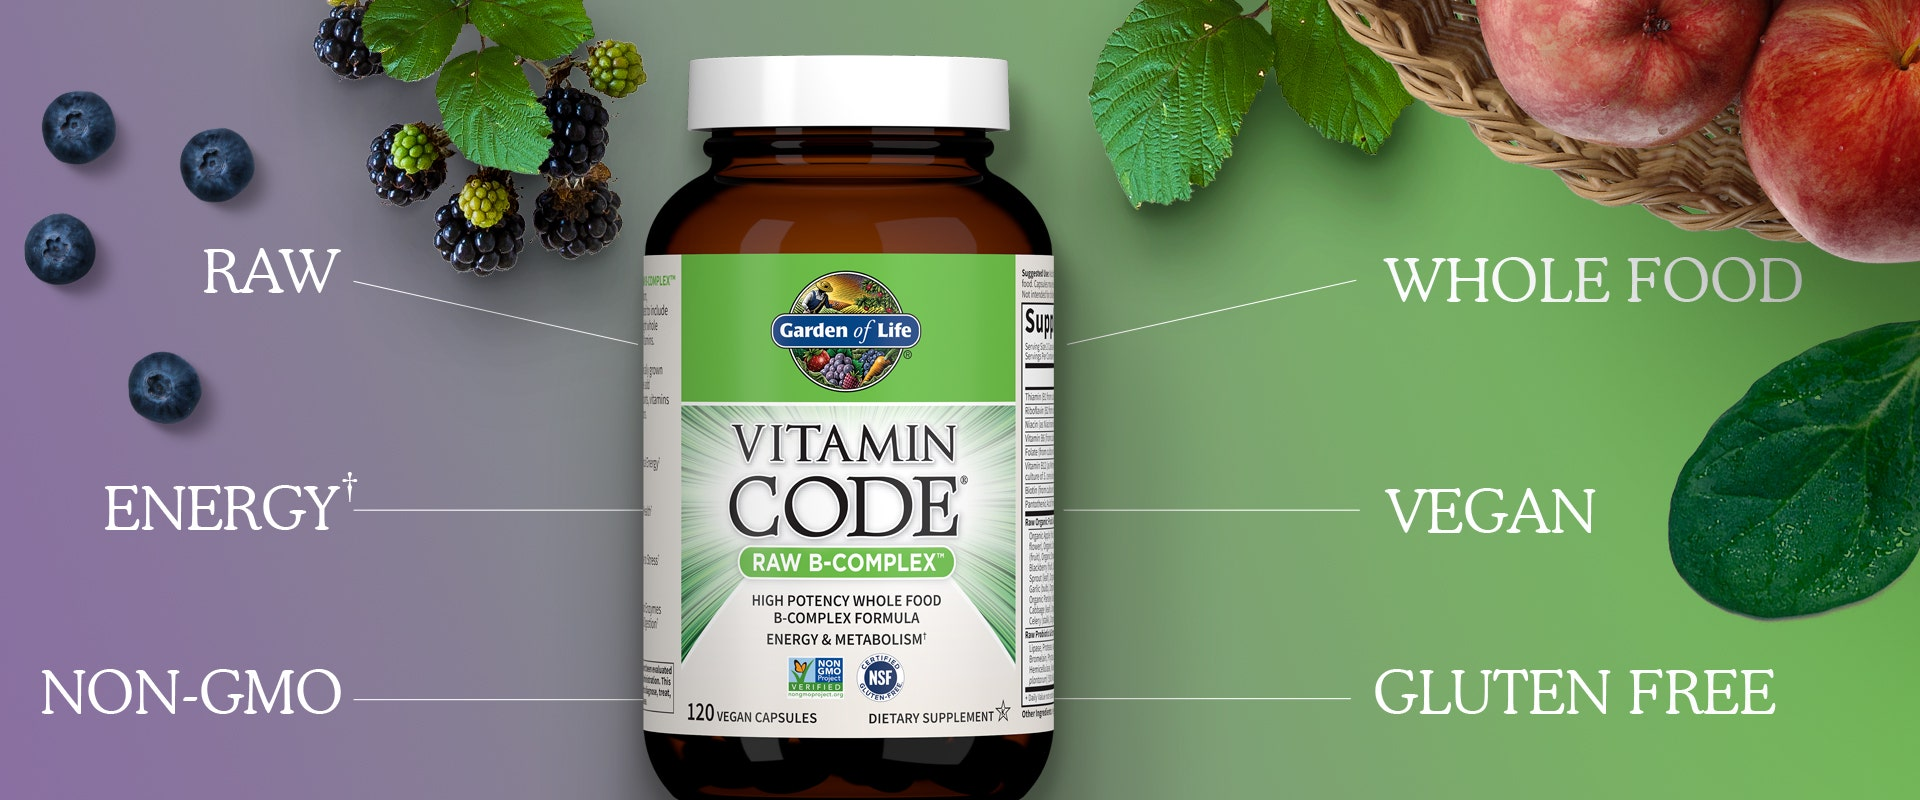 Vitamin Code Raw B-Complex Capsules